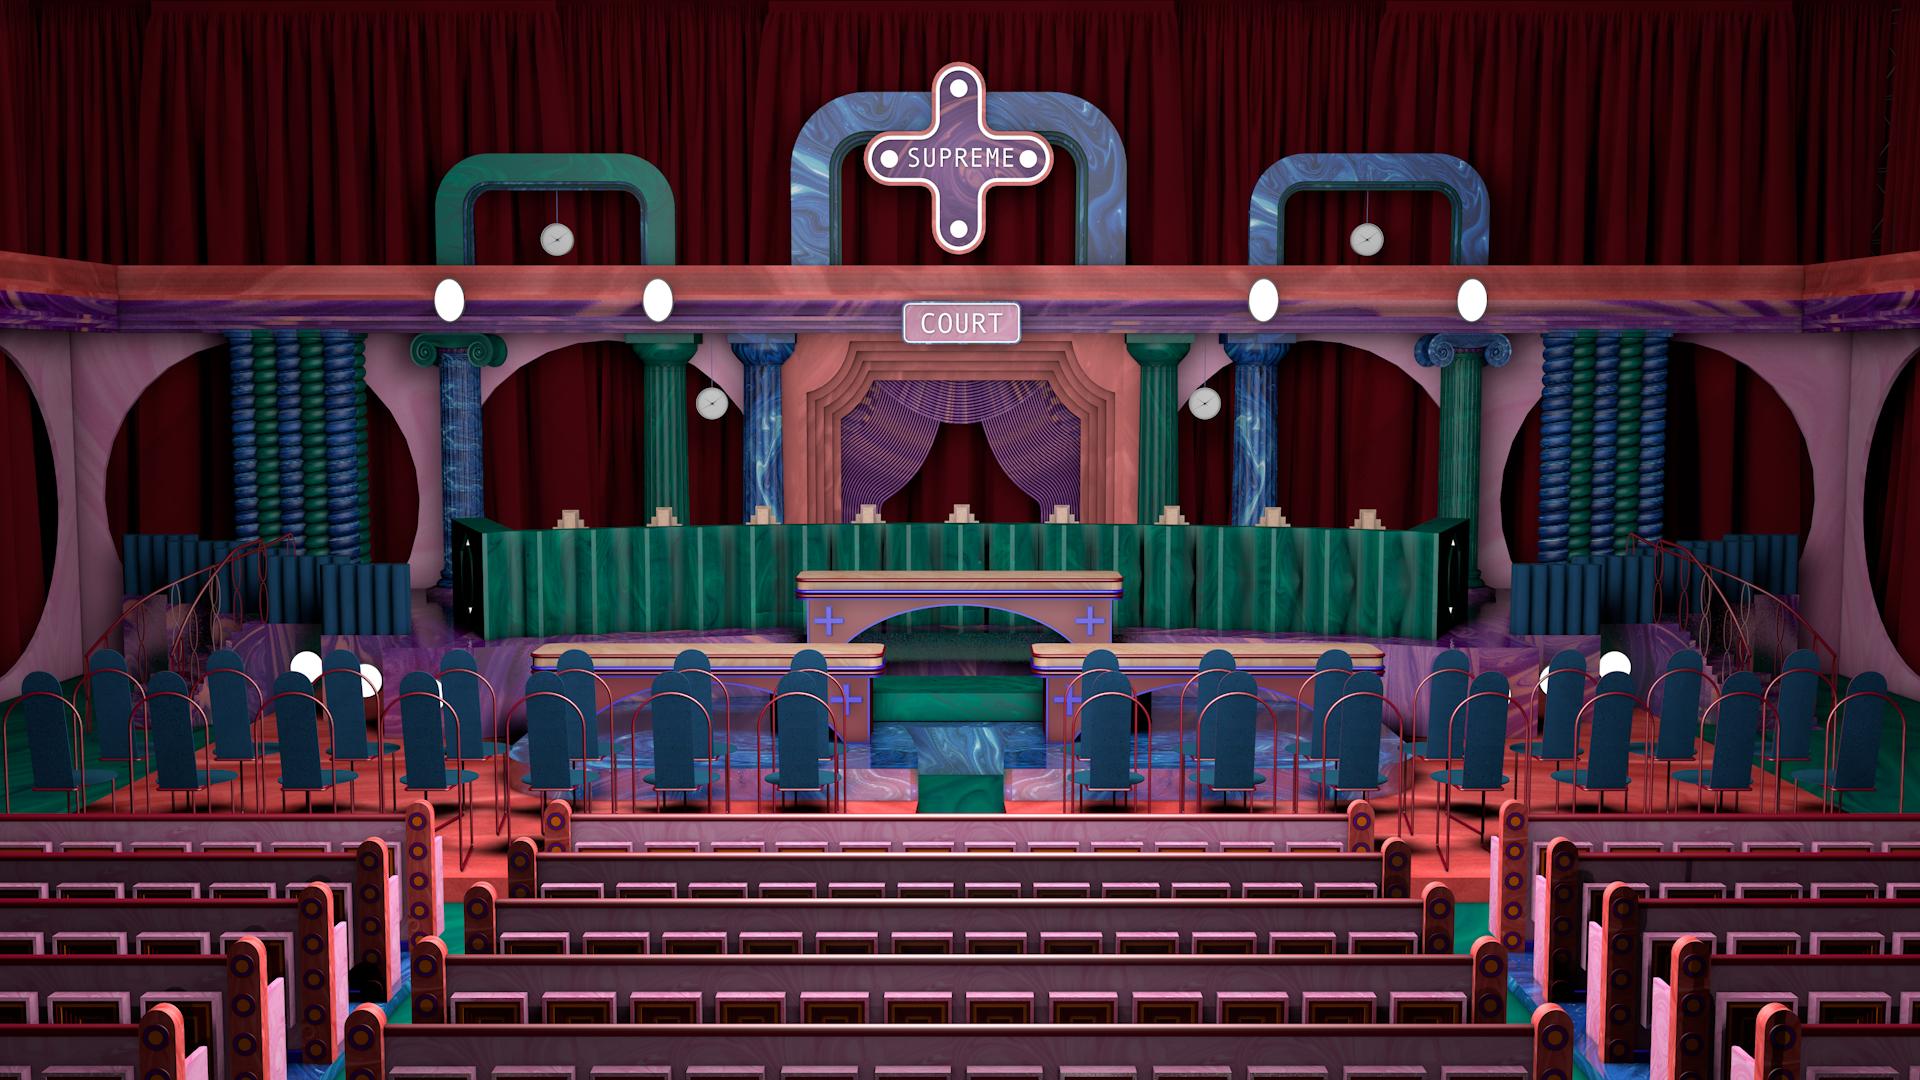 Supreme court pop stage set